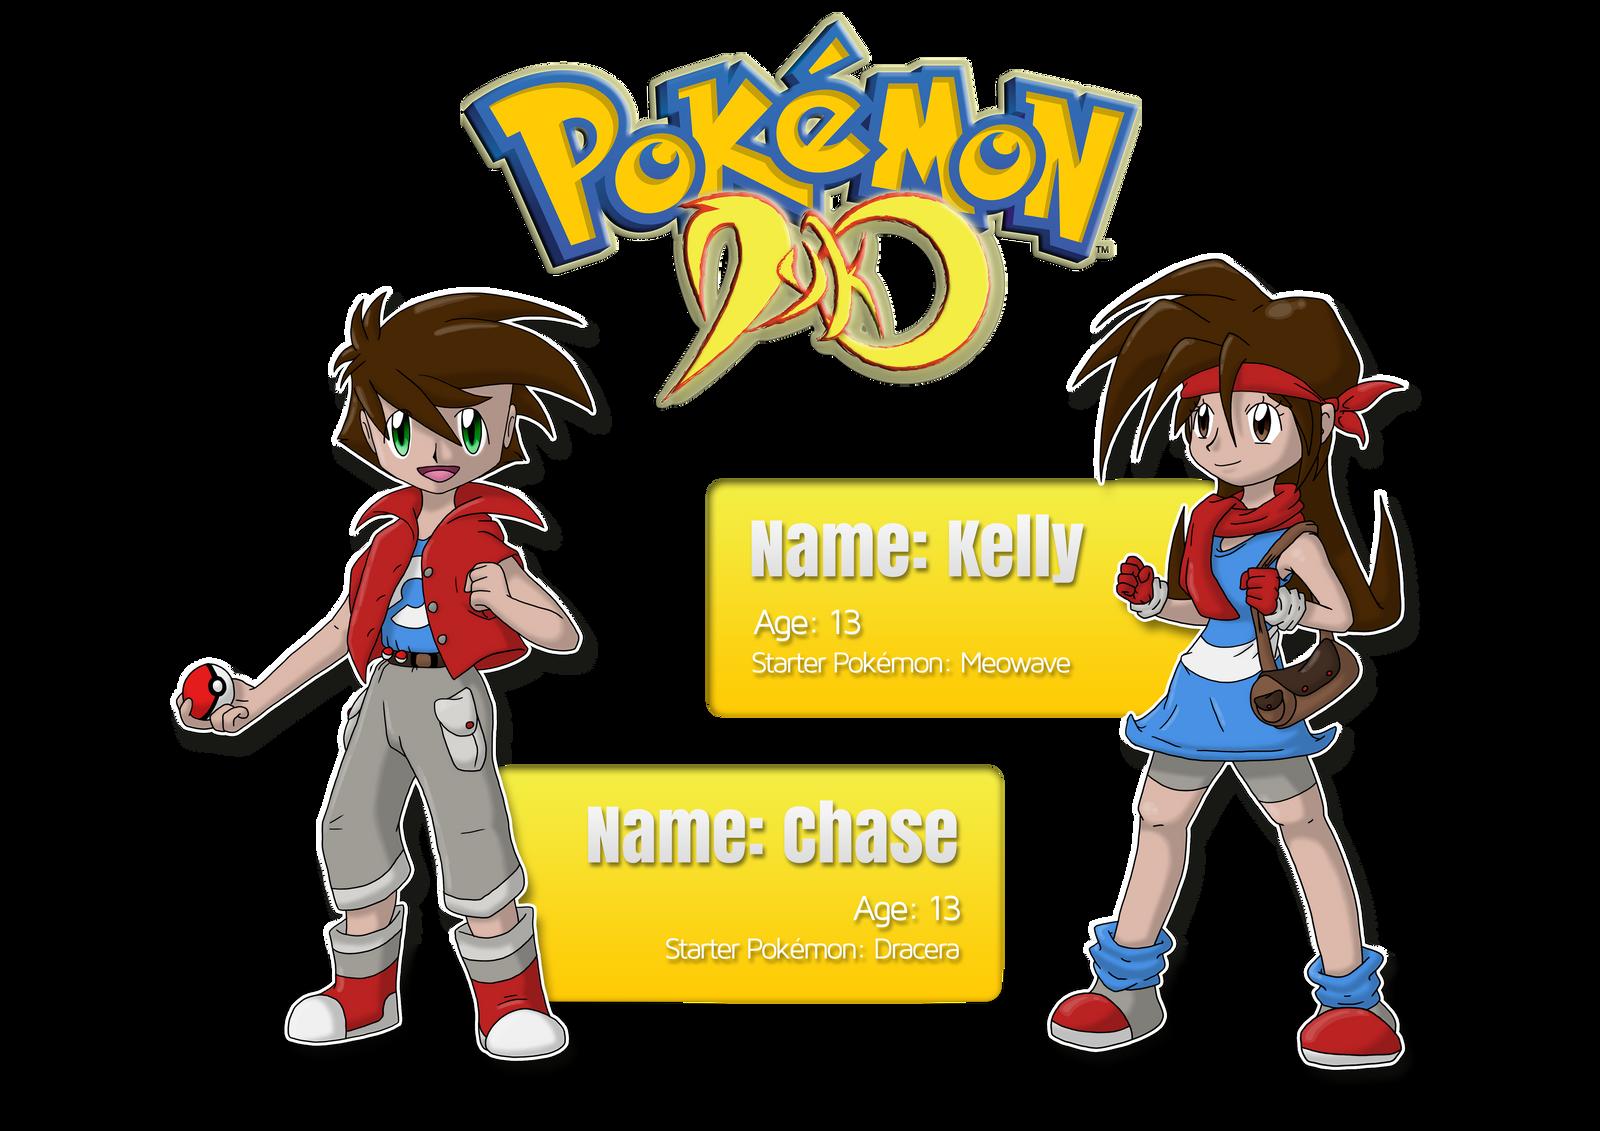 Pokemon Dyko Main Characters Revealed 354704732